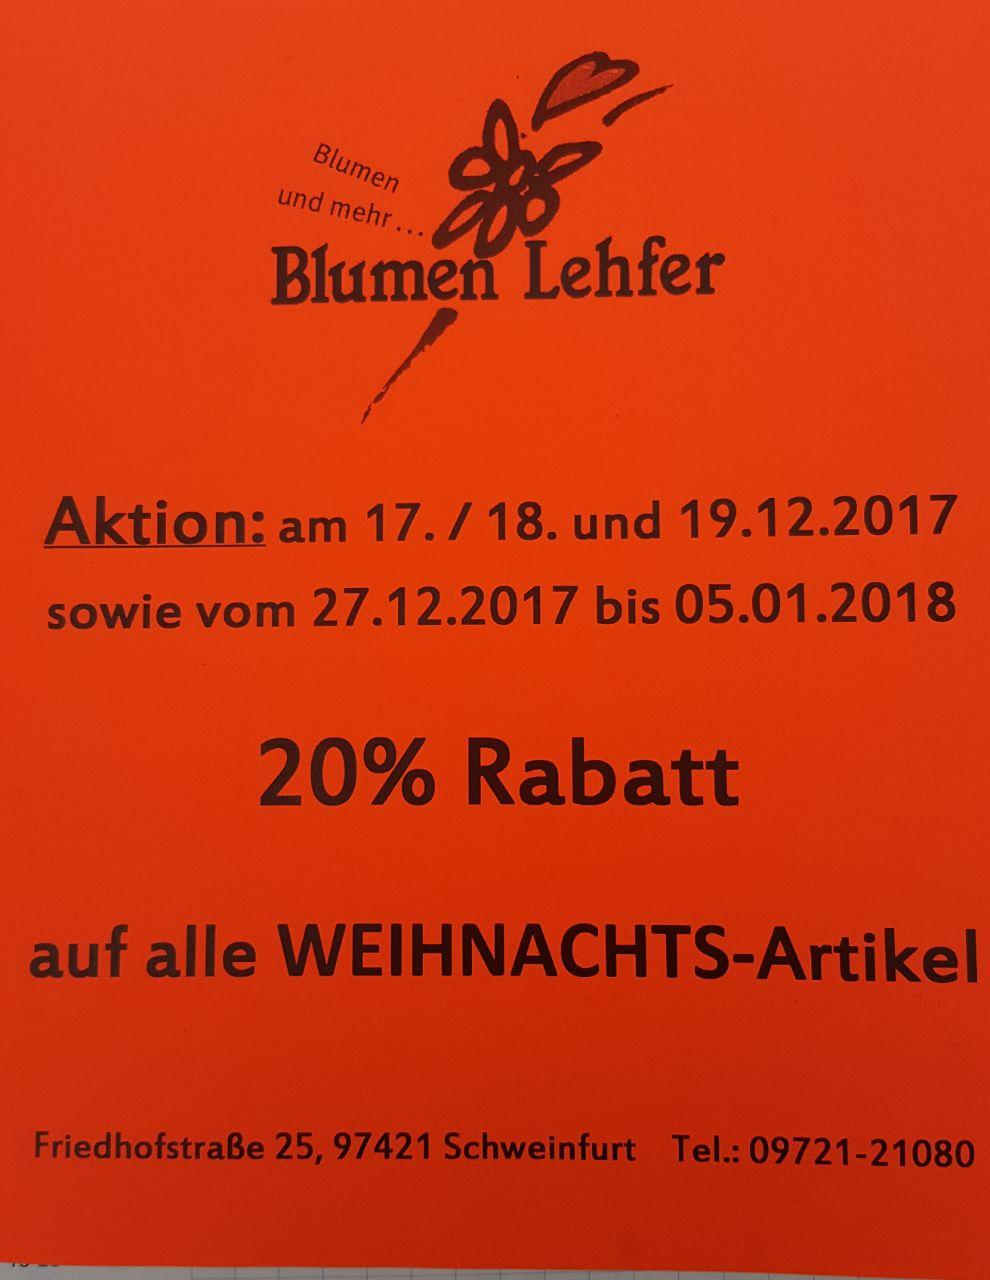 Blumen Lehfer  Schweinfurt  Floristik Gestecke Geschenke